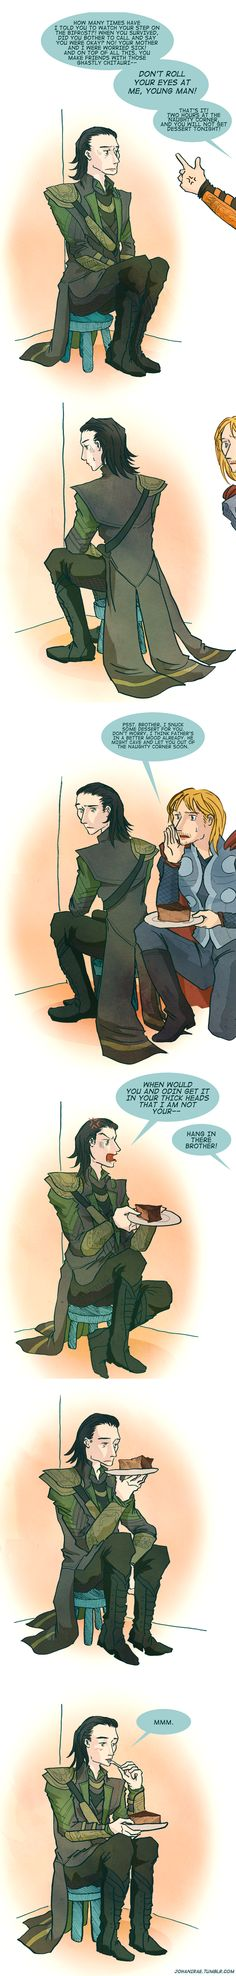 Asgardian justice by johanirae.deviantart.com on @deviantART <<--Hehehe #lokifanart